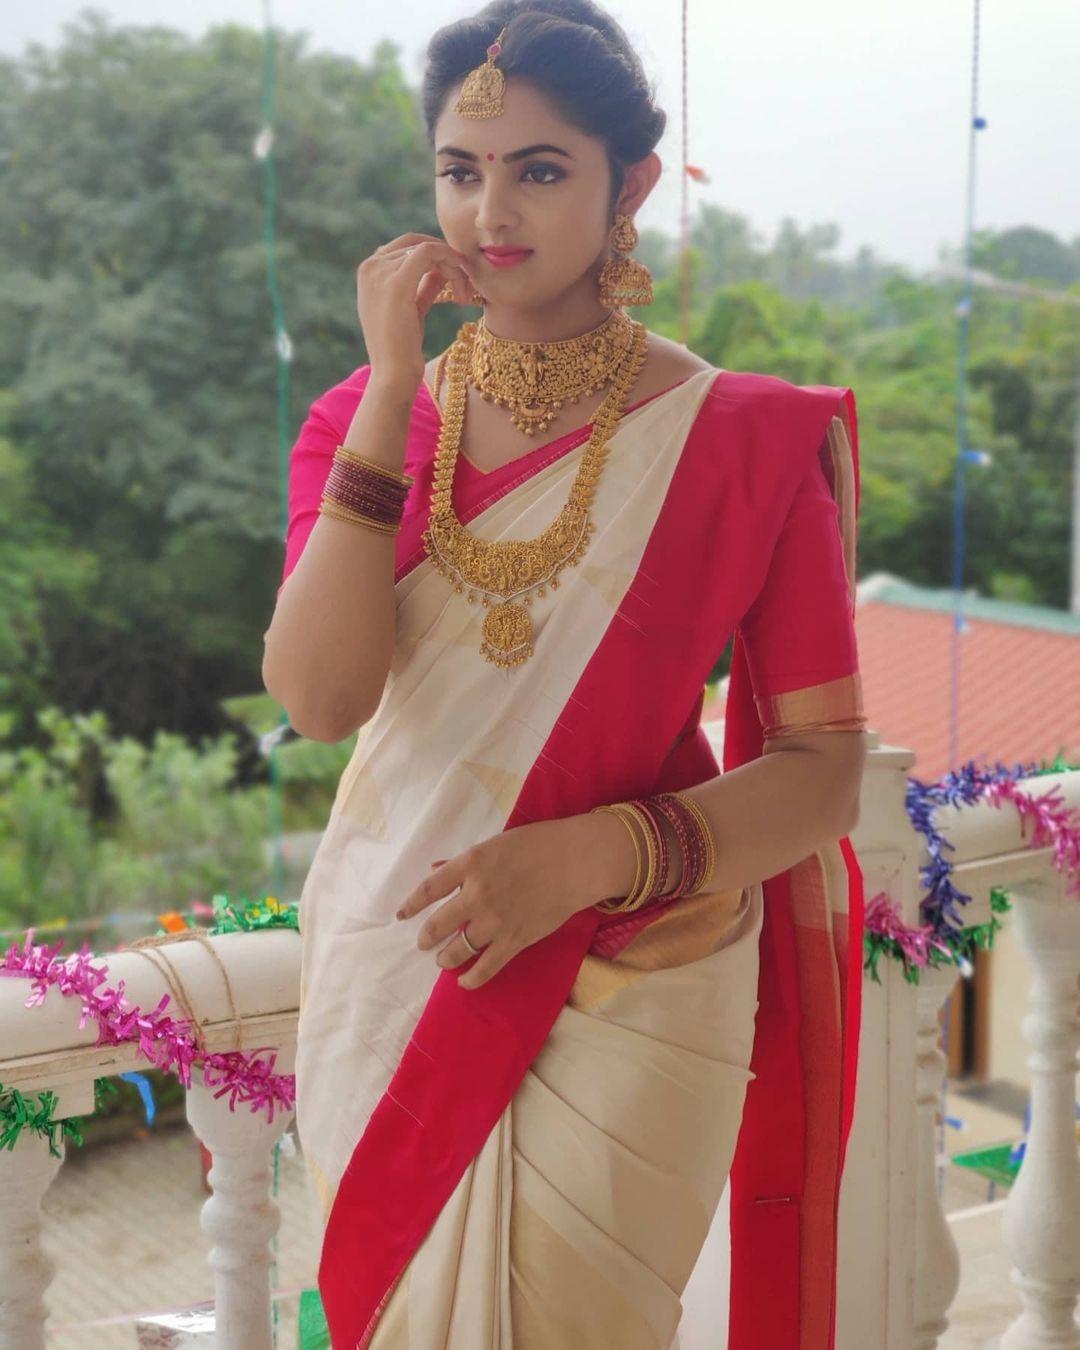 Radhika_Preethi_14655215929_22